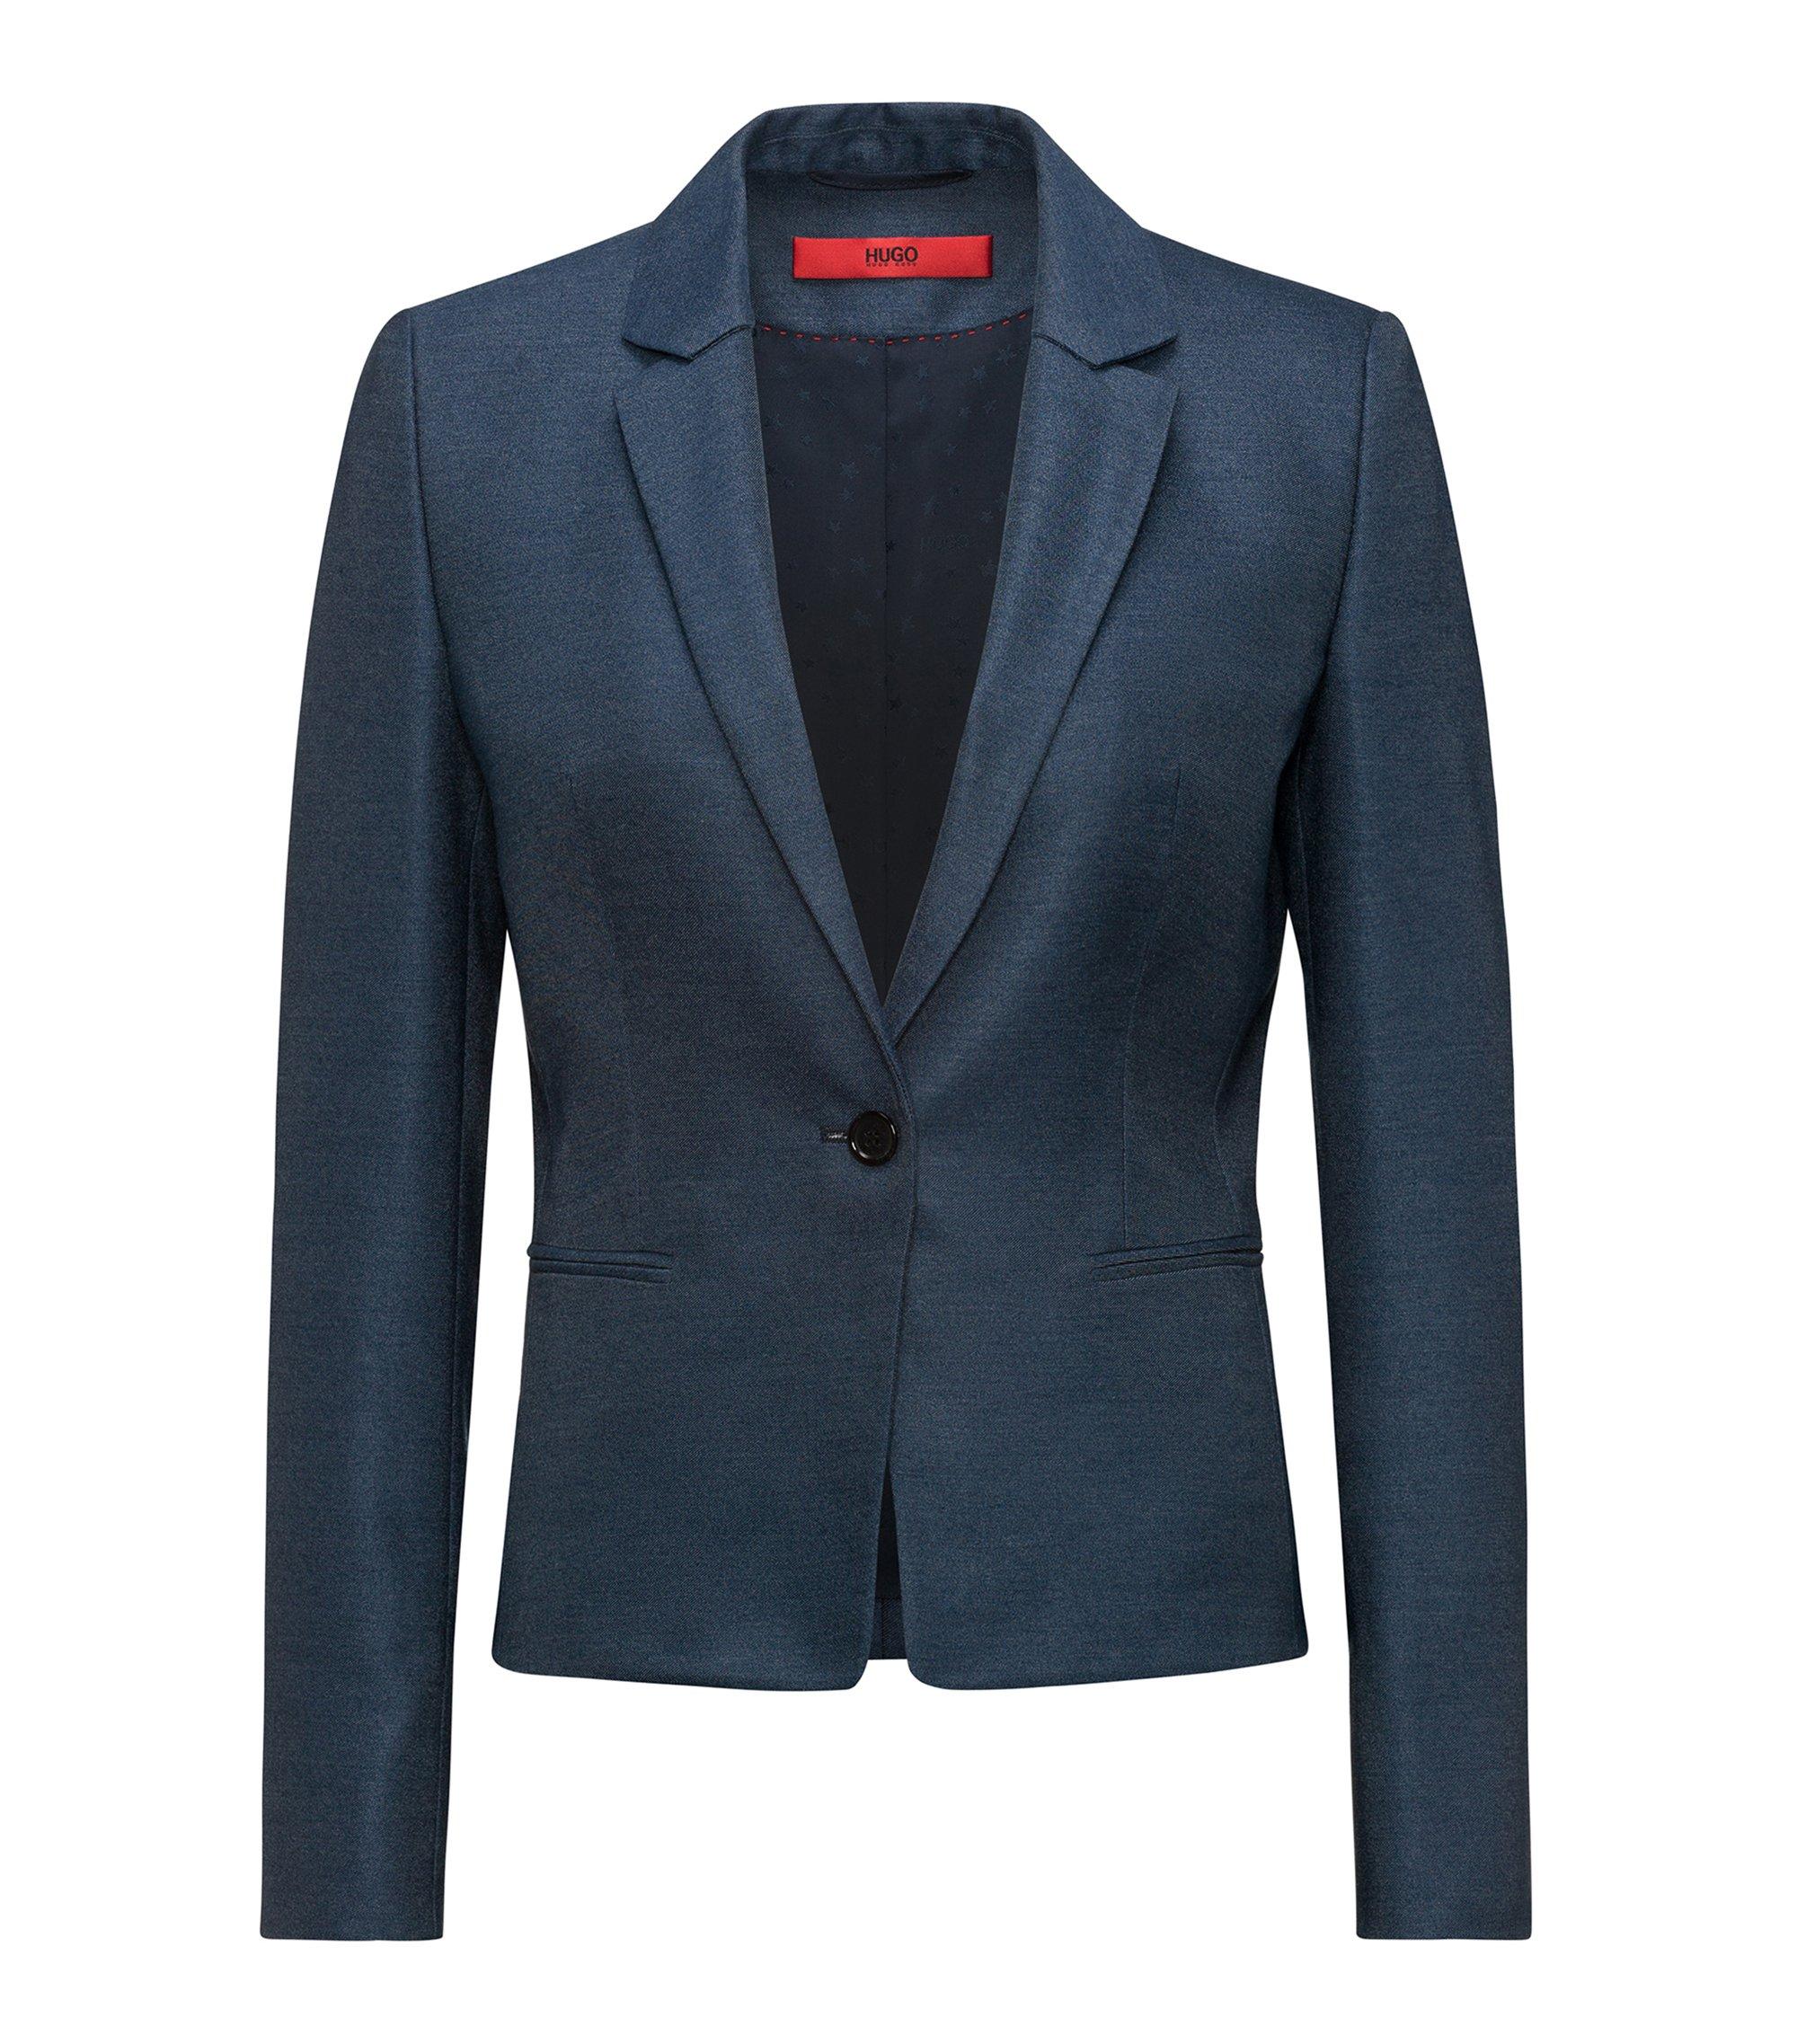 Blazer Slim Fit en tissu stretch légèrement brillant, Bleu foncé